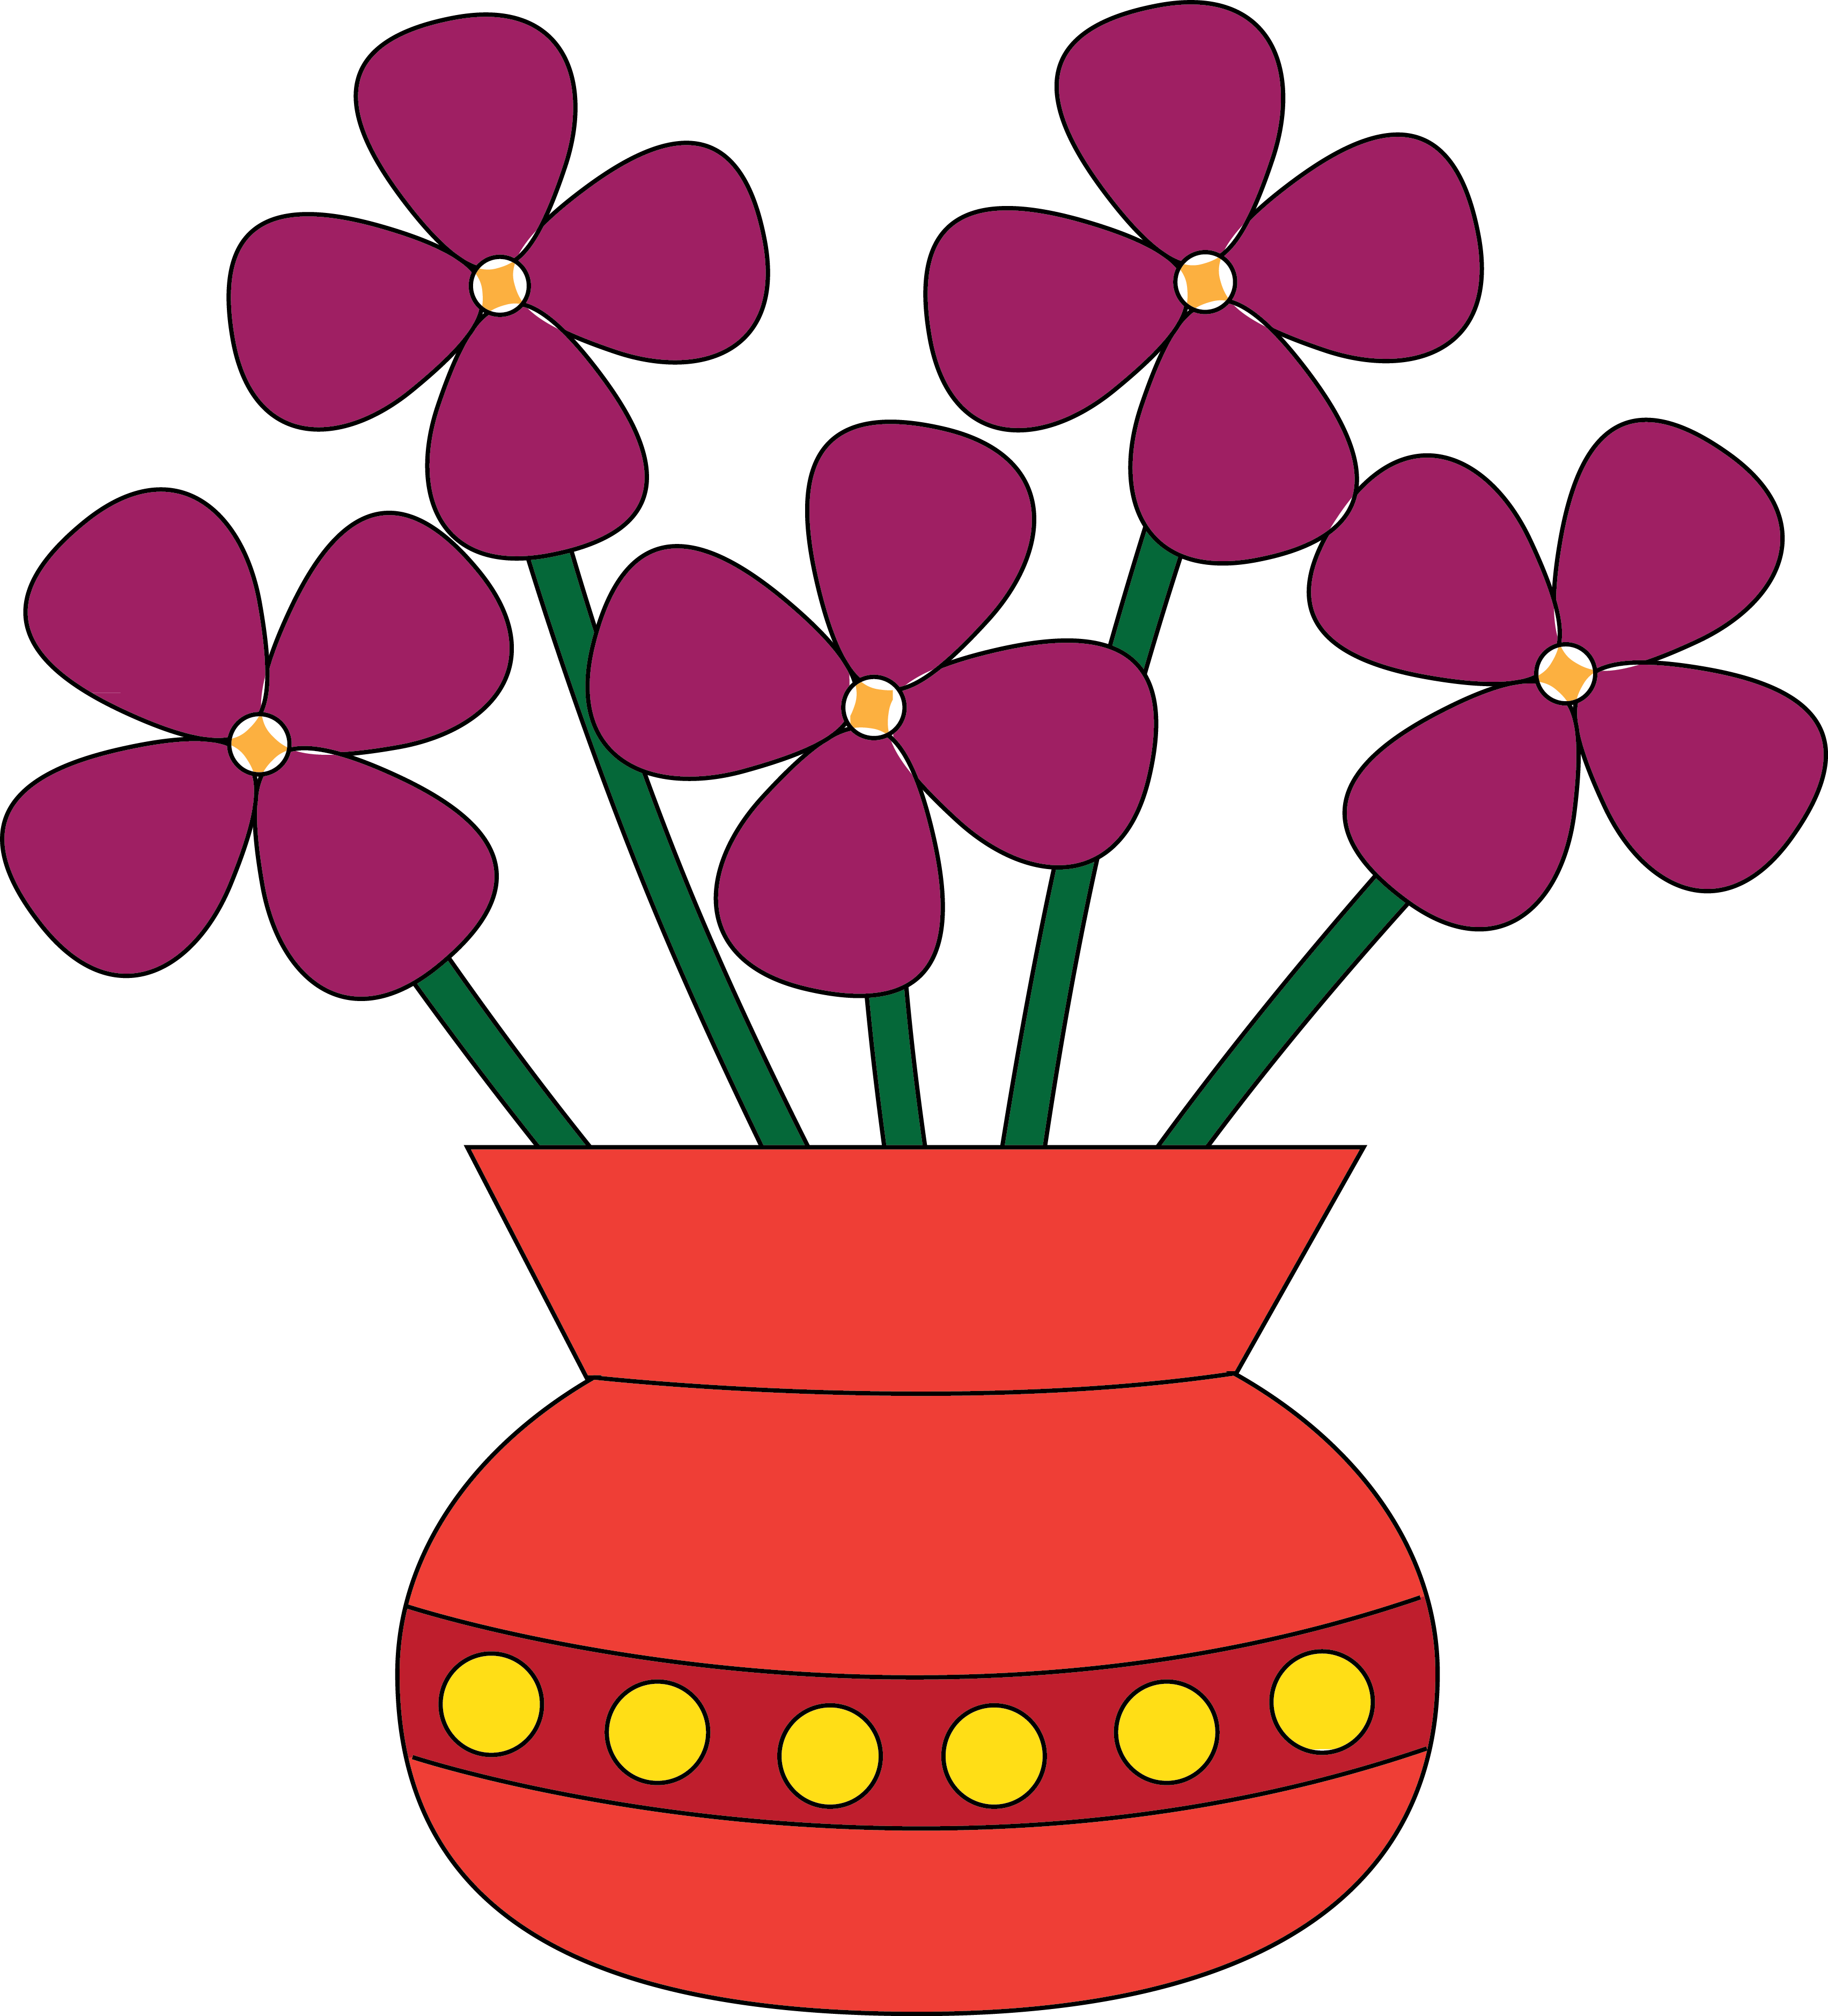 Vase clipart. Panda free images